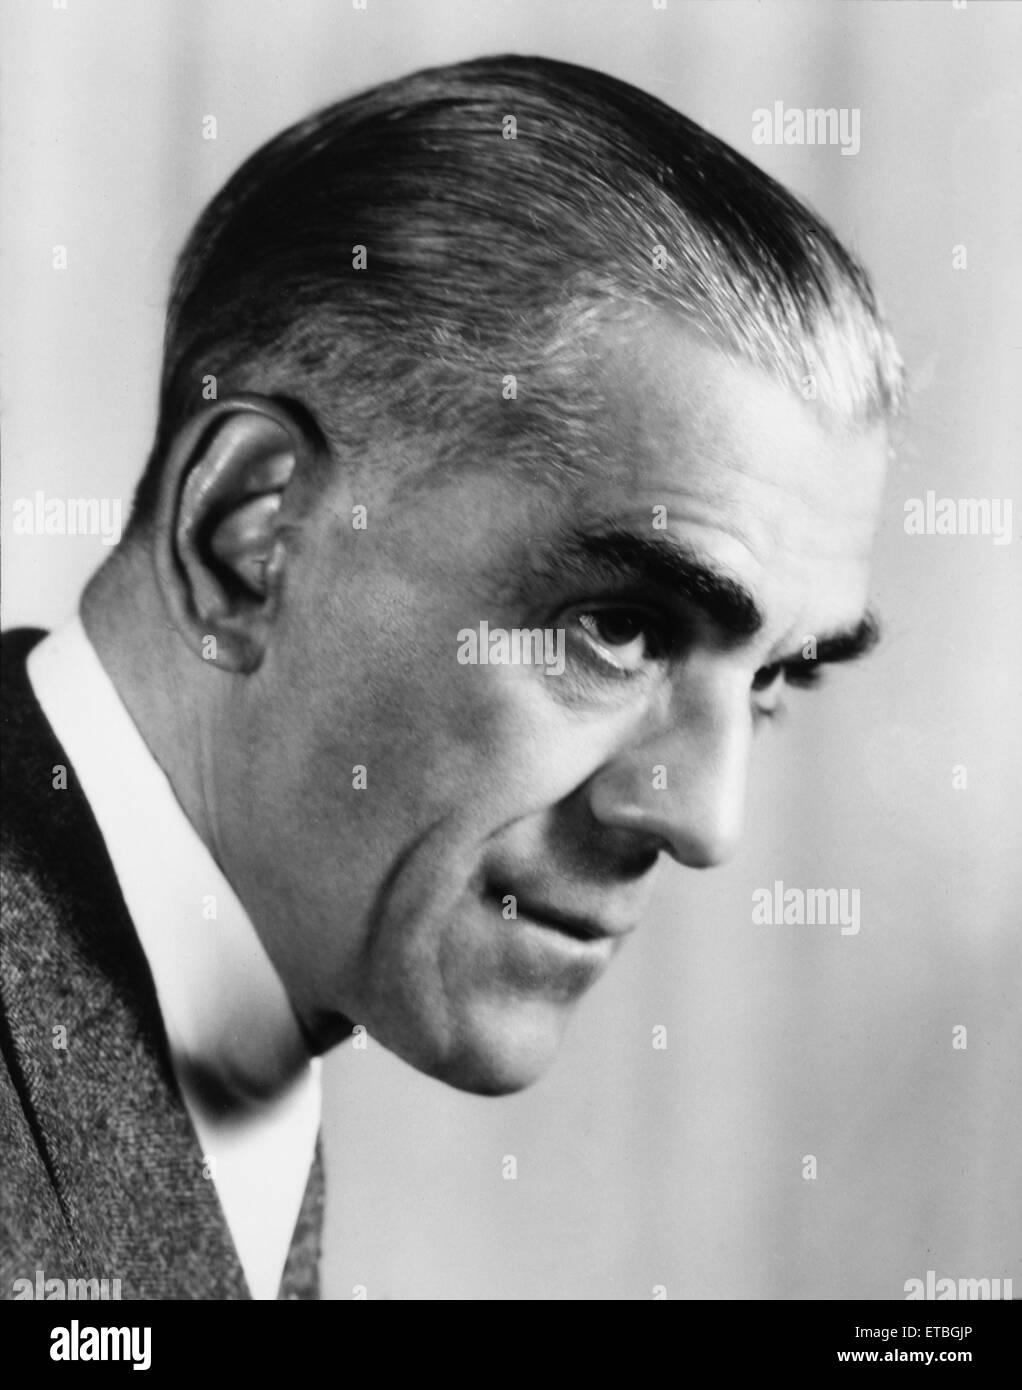 Actor Boris Karloff, Portrait, 1942 - Stock Image